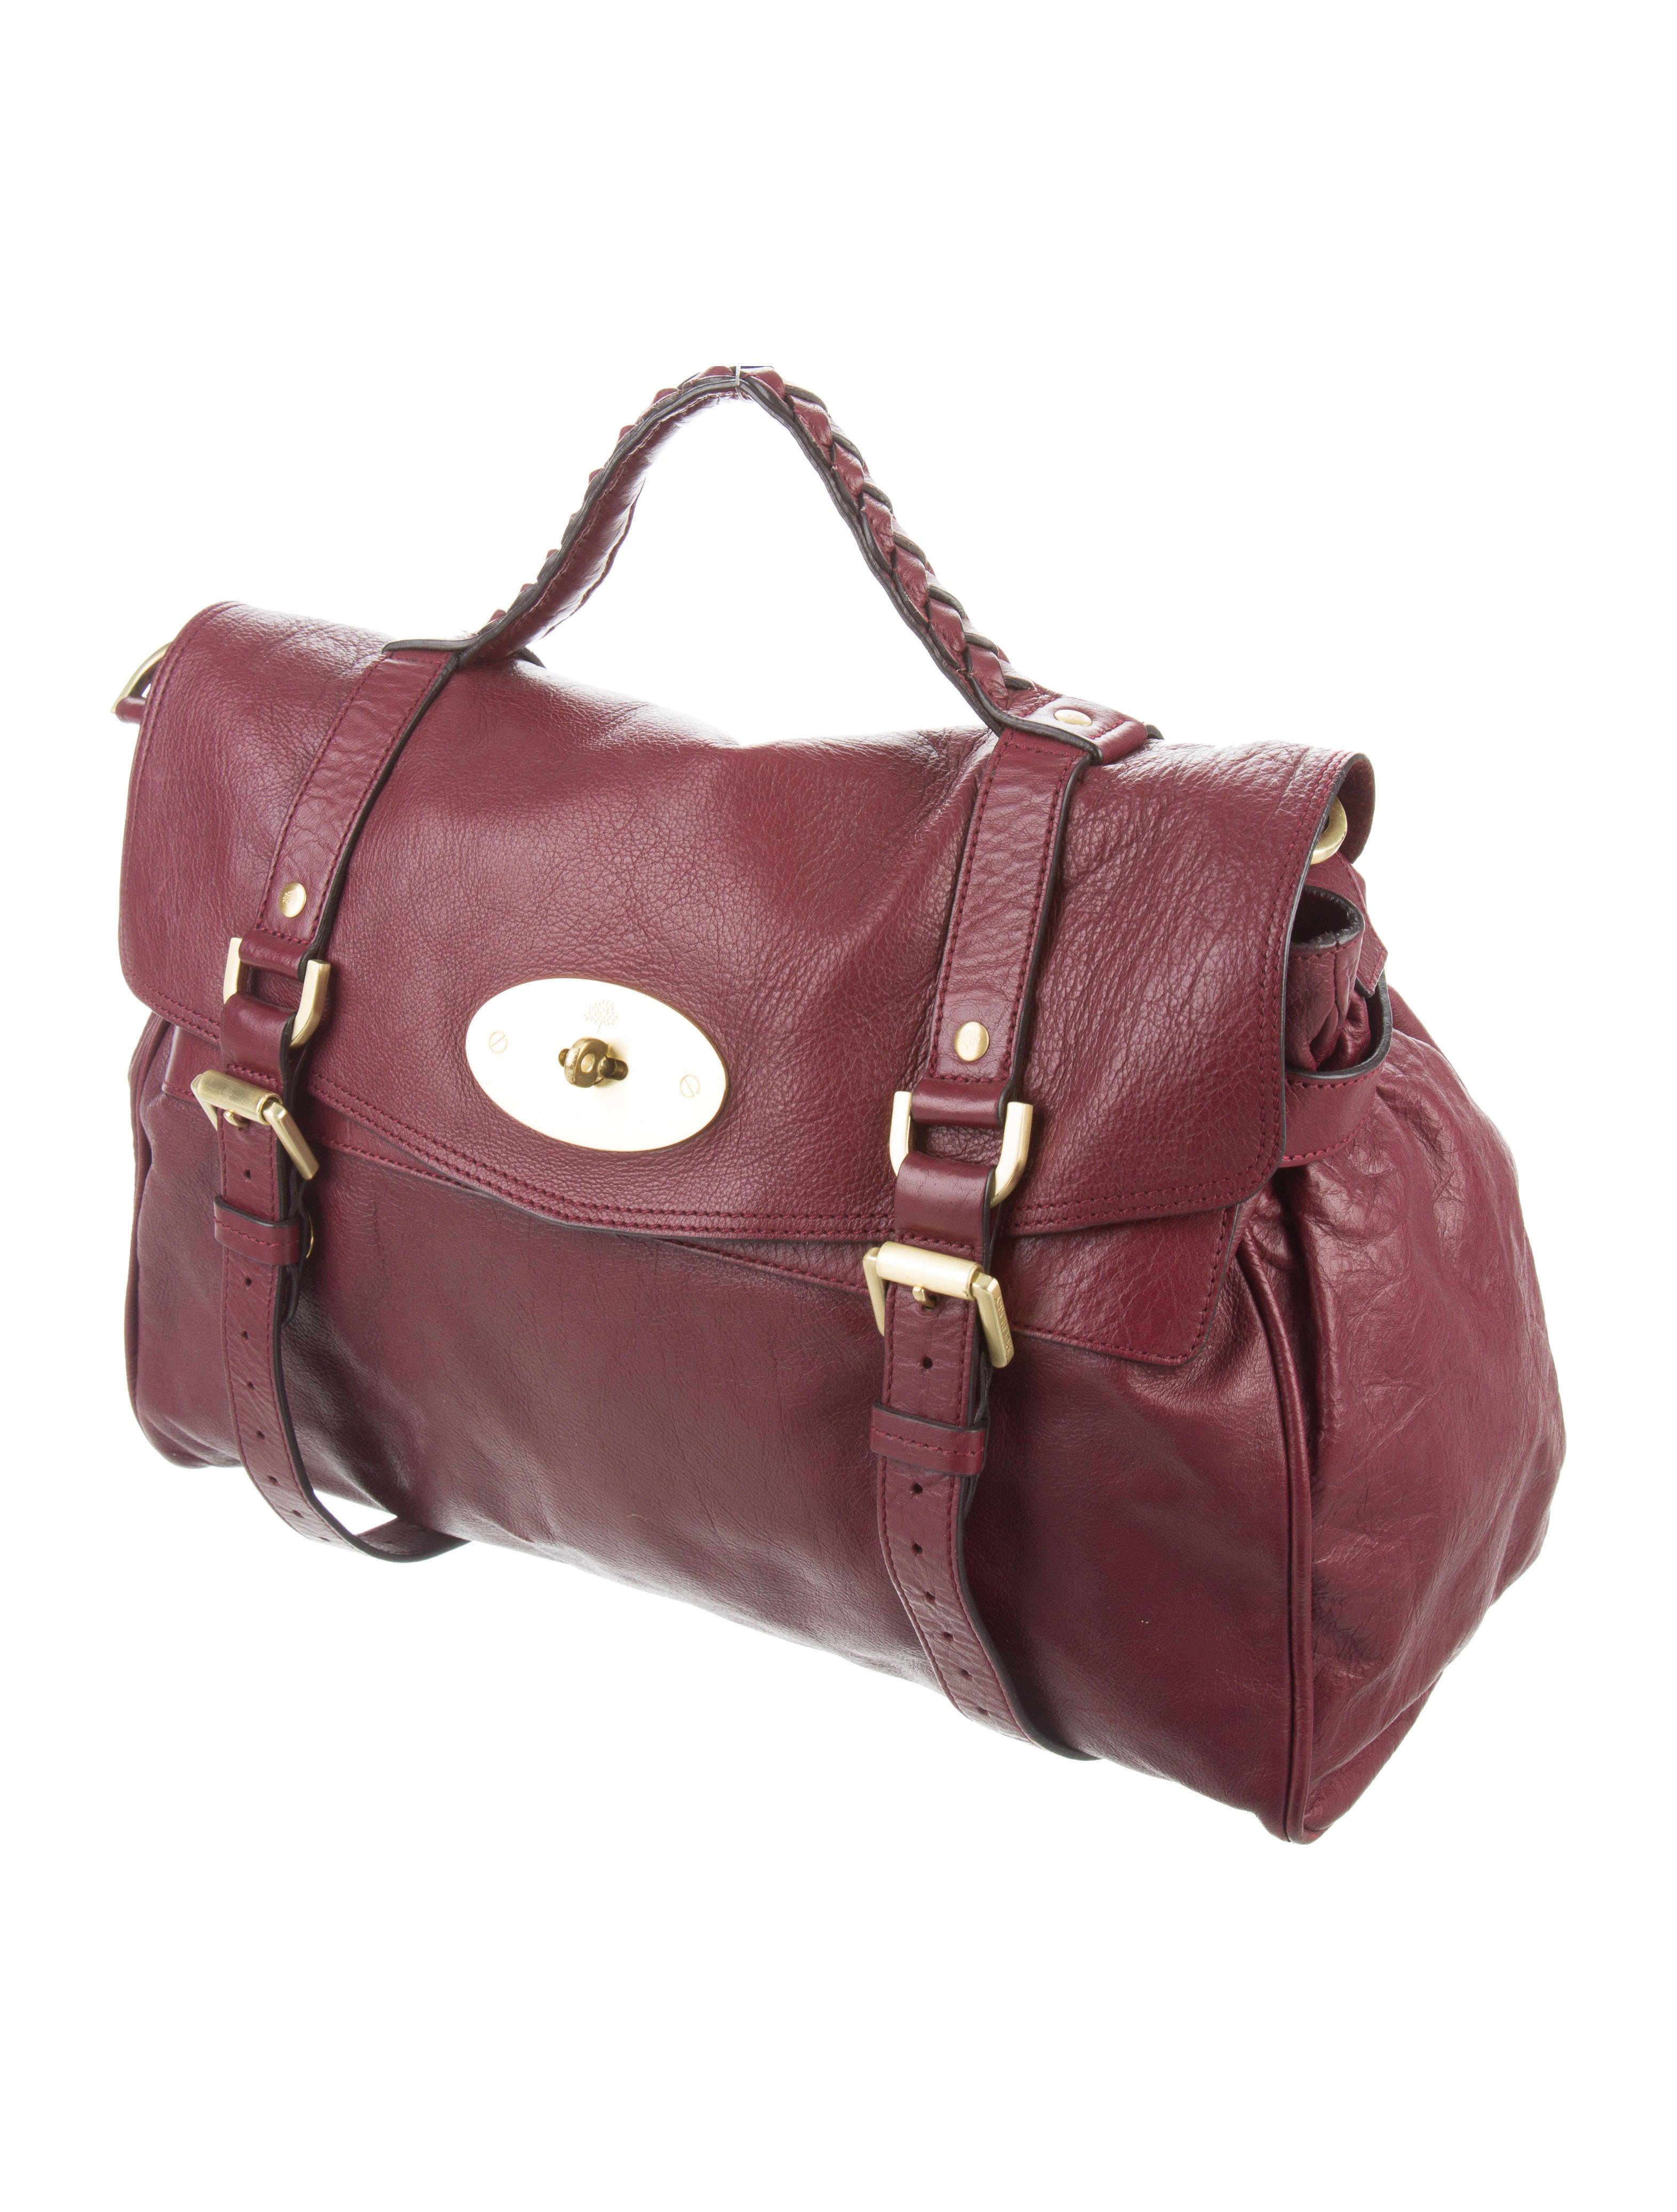 Mulberry Laukku Myydään : Mulberry alexa laukku makeup bag mugeek vidalondon